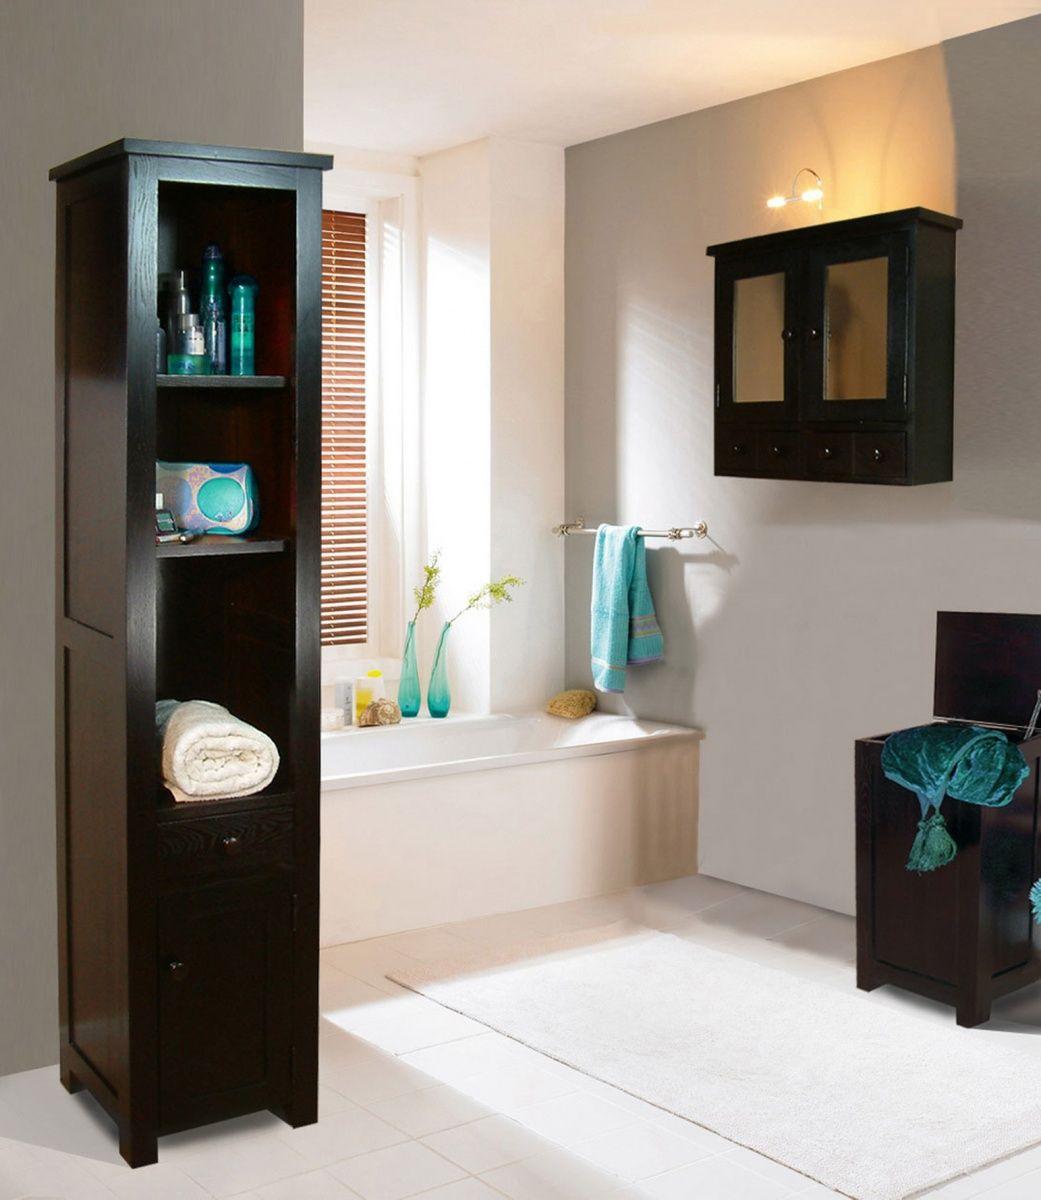 Bathroom Floor Standing Storage Cabinets Design Interior Home - Small floor standing bathroom cabinet for bathroom decor ideas